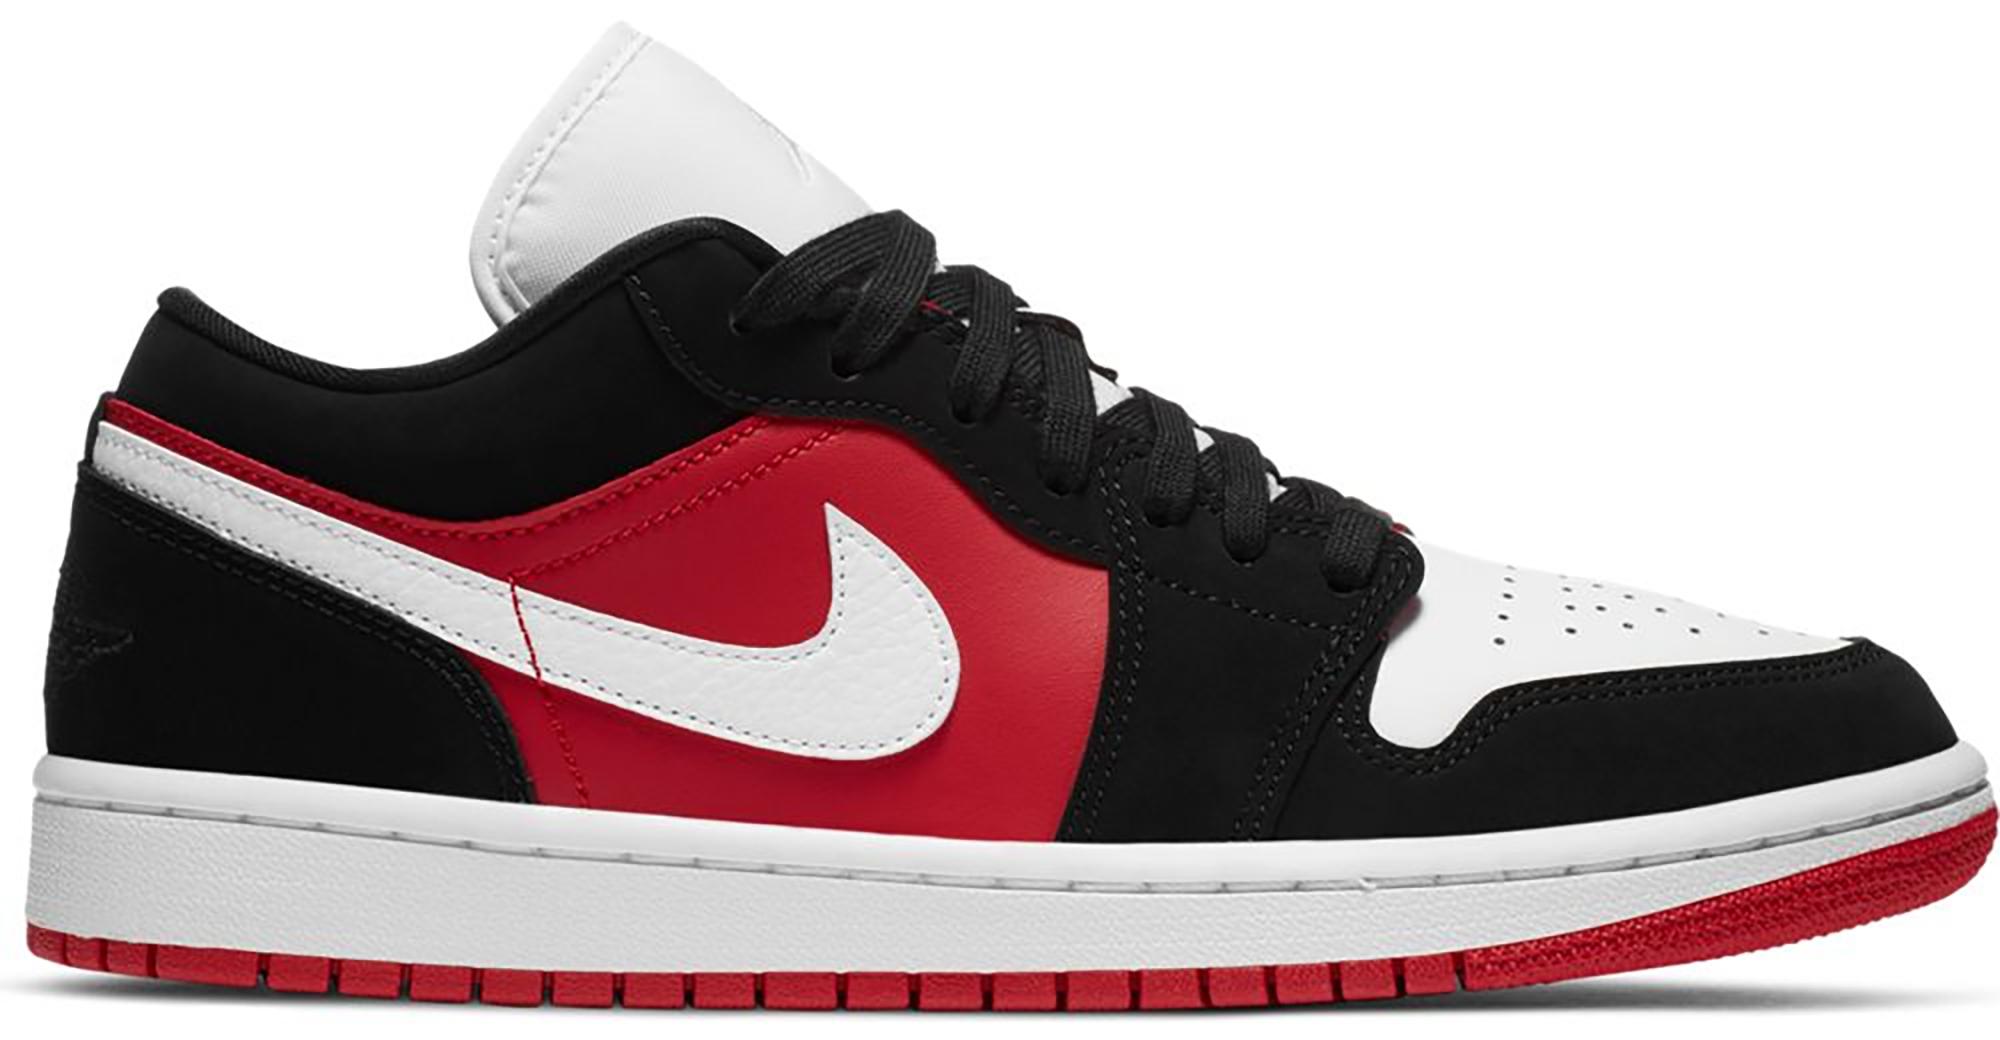 Jordan 1 Low Black White Gym Red (W